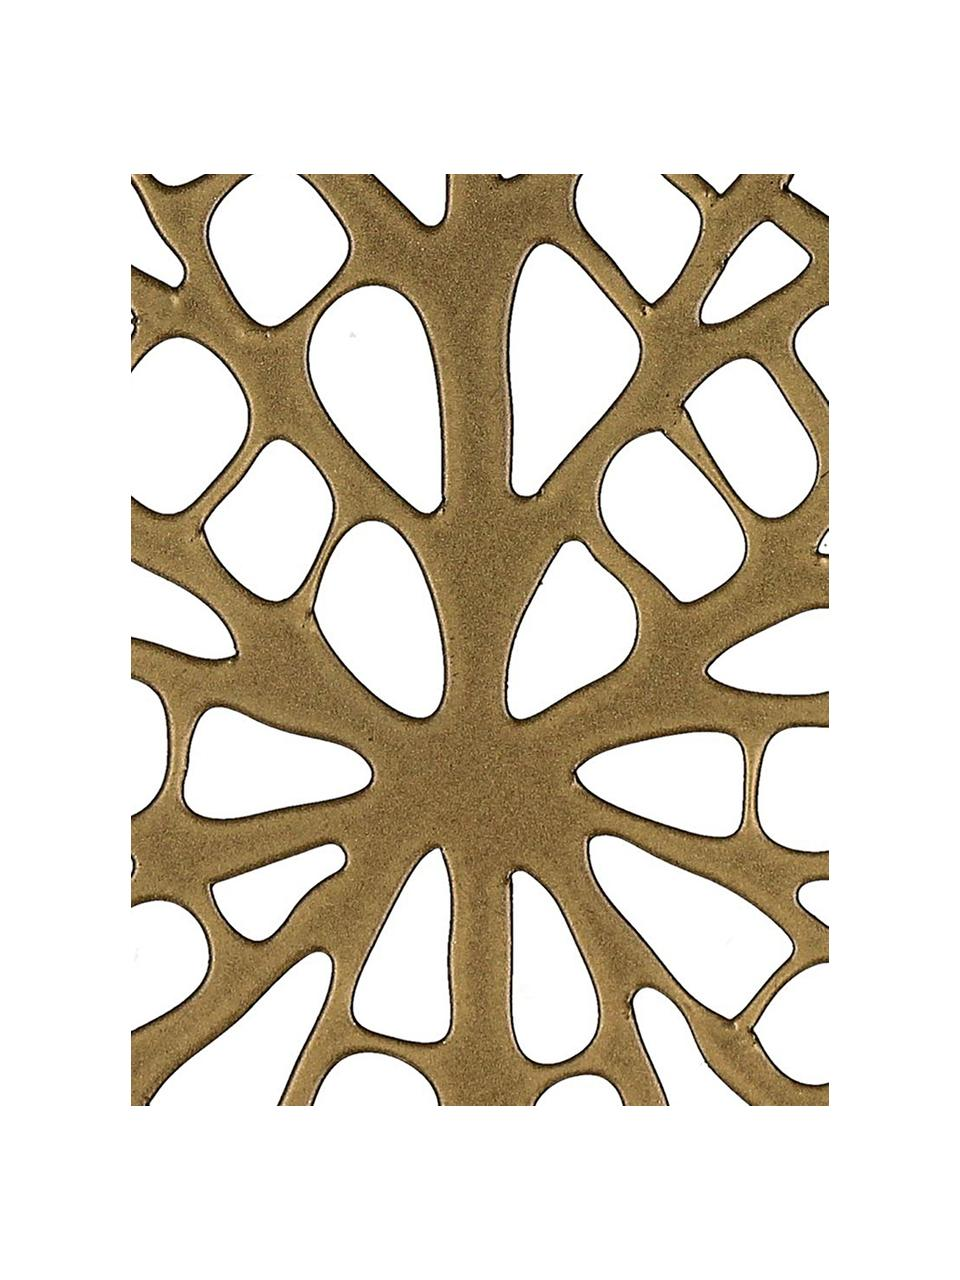 Messingfarbene Untersetzer Orient in Blattform, 6 Stück, Metall, beschichtet, Messingfarben, B 12 x T 11 cm